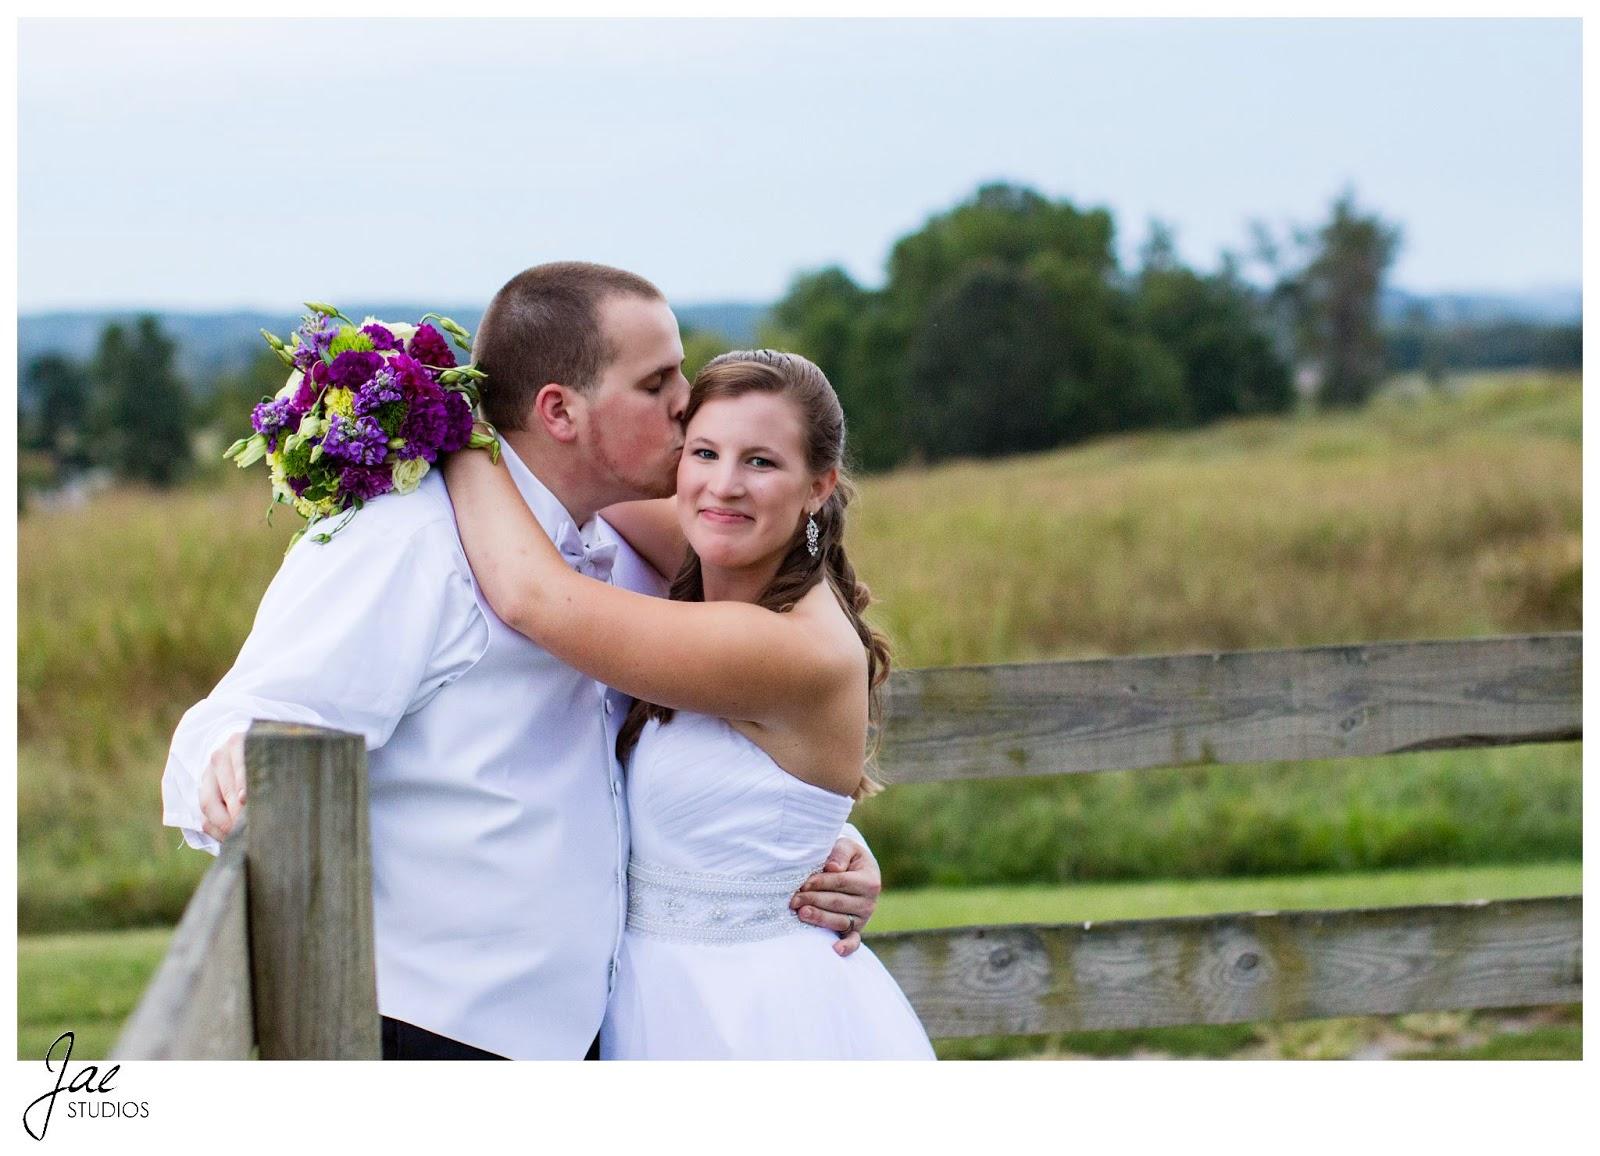 Jonathan and Julie, Bird cage, West Manor Estate, Wedding, Lynchburg, Virginia, Jae Studios, wooden fence, bouquet, flowers, purple, tuxedo, wedding dress, kissing, hugging